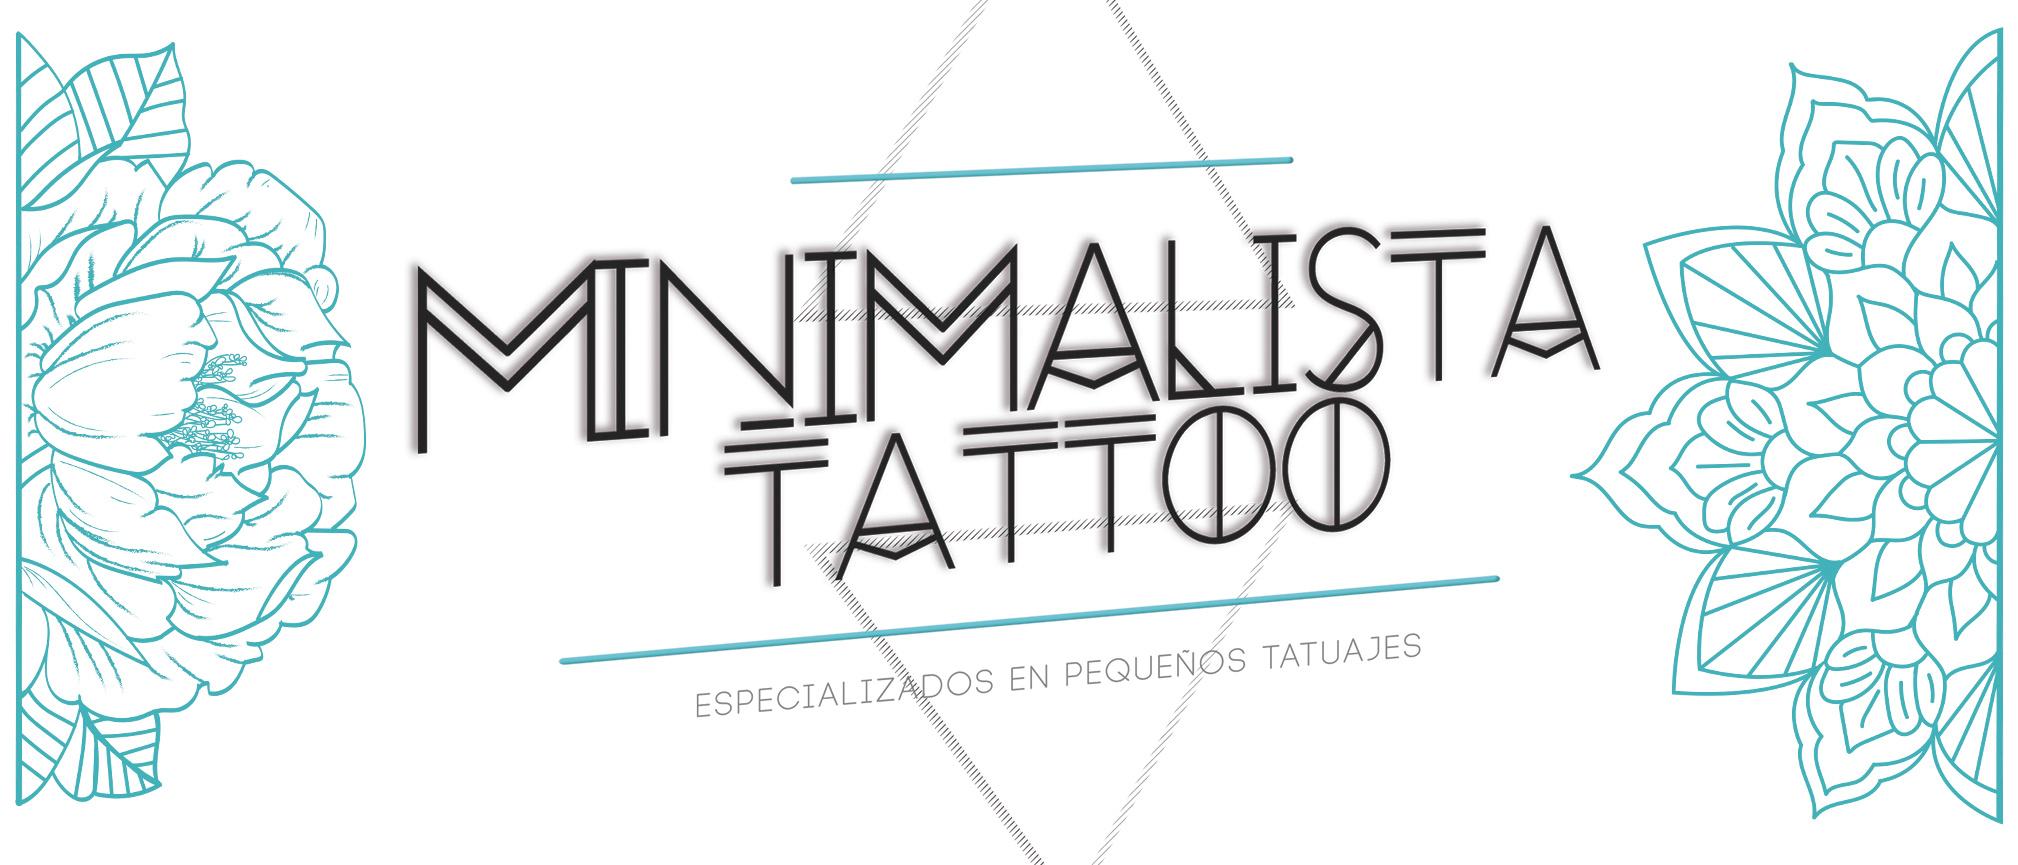 Branding + Banner / Estudio tatuaje